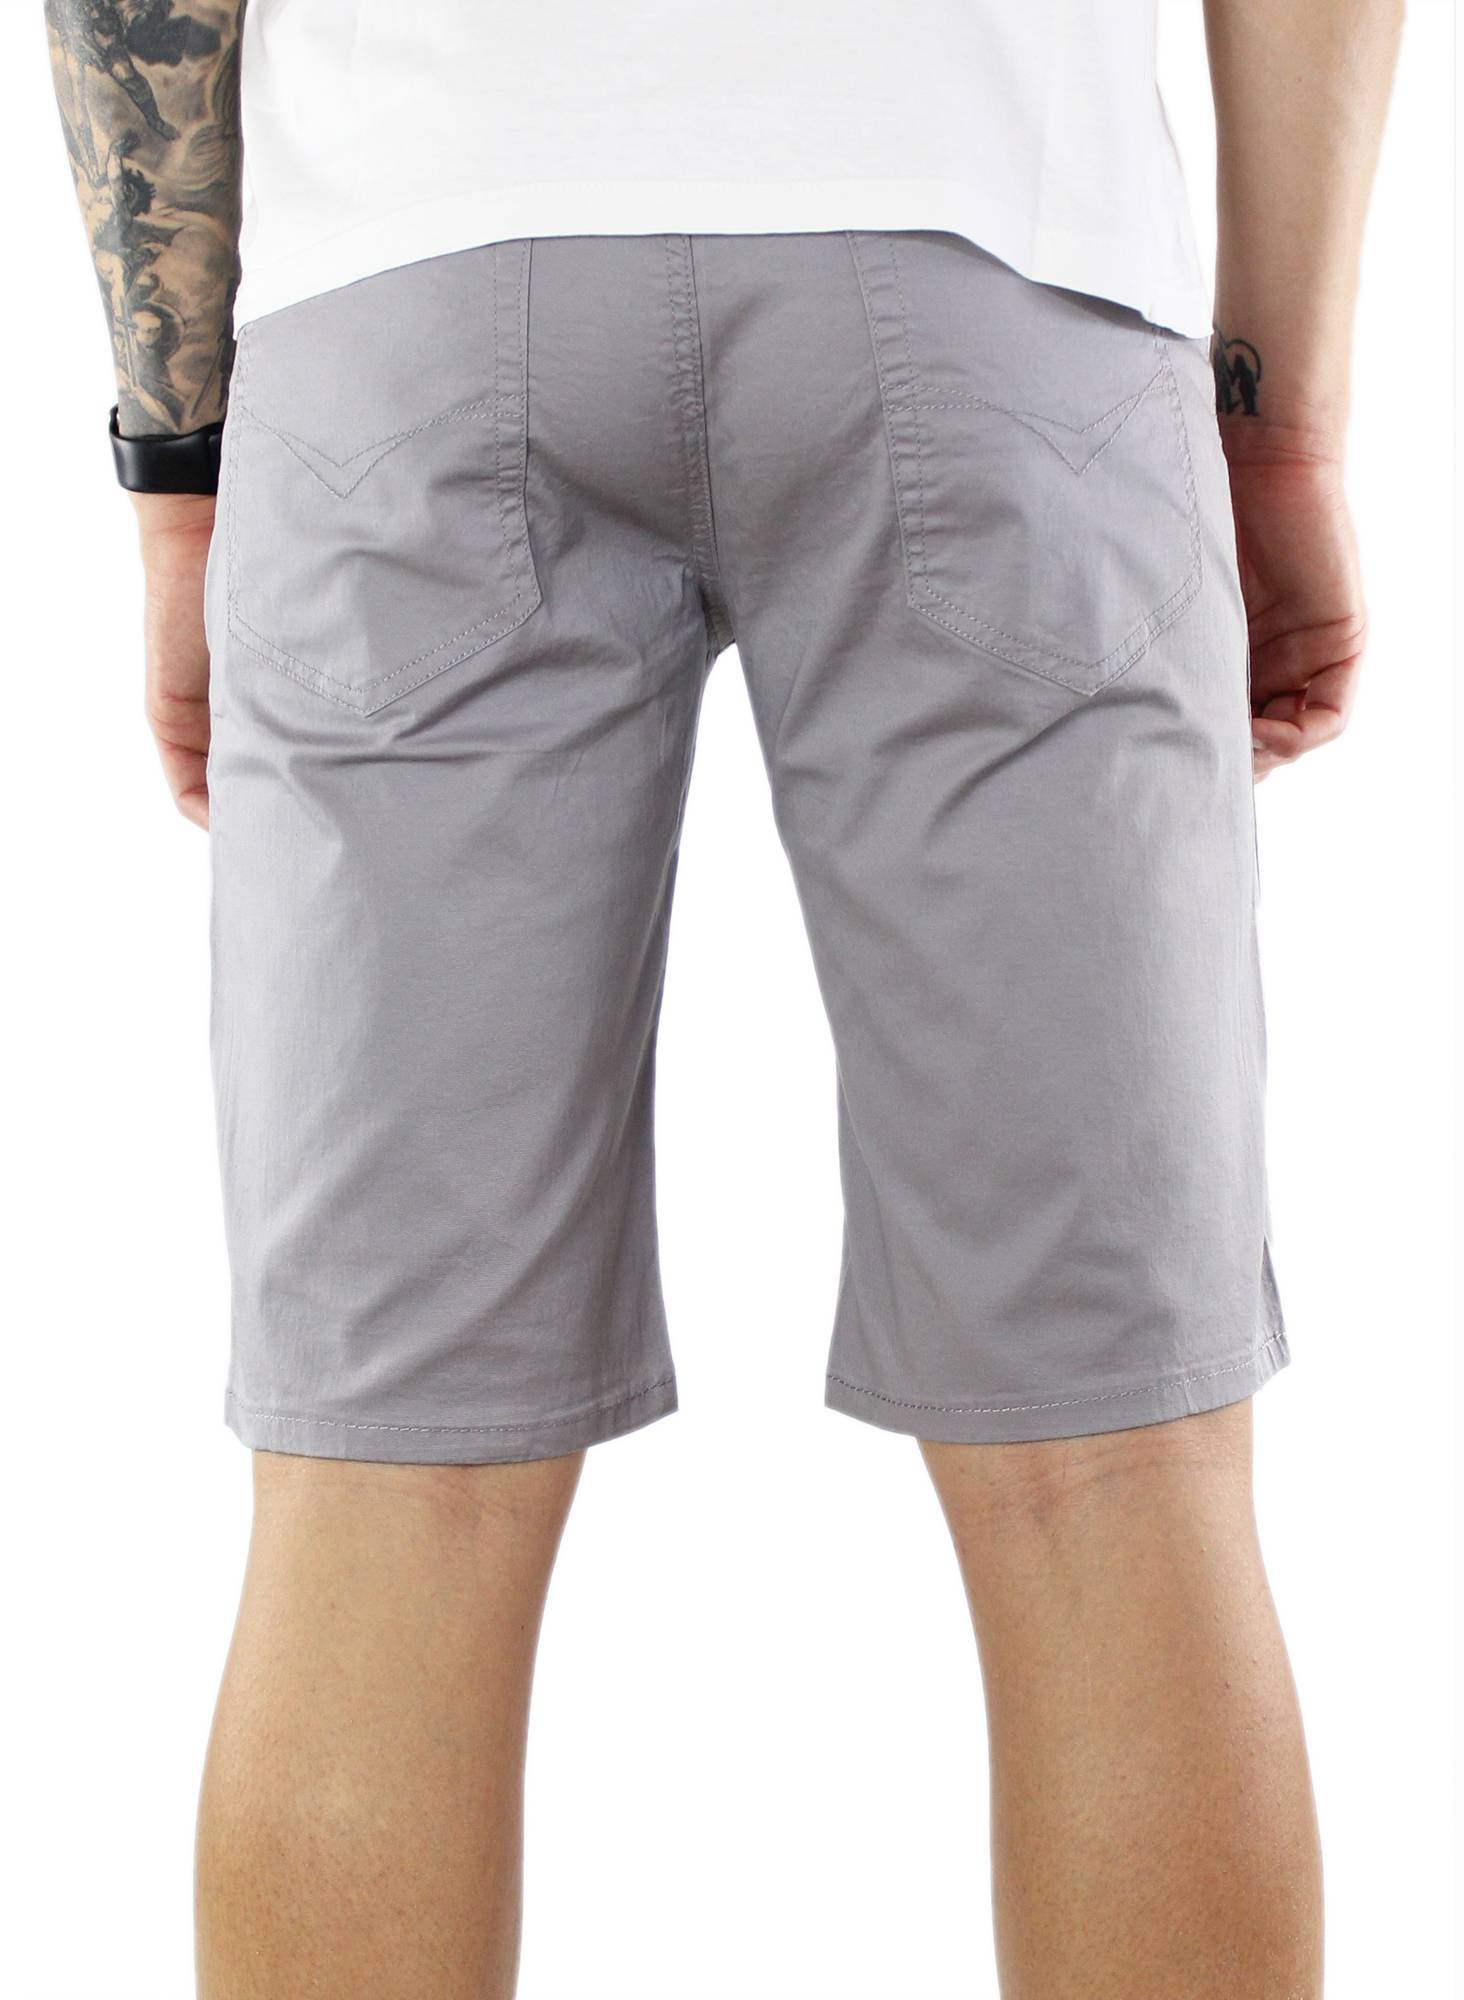 Bermuda-Uomo-Cotone-Slim-Fit-Pantalone-Corto-Shorts-Pantaloncini-Casual miniatuur 7